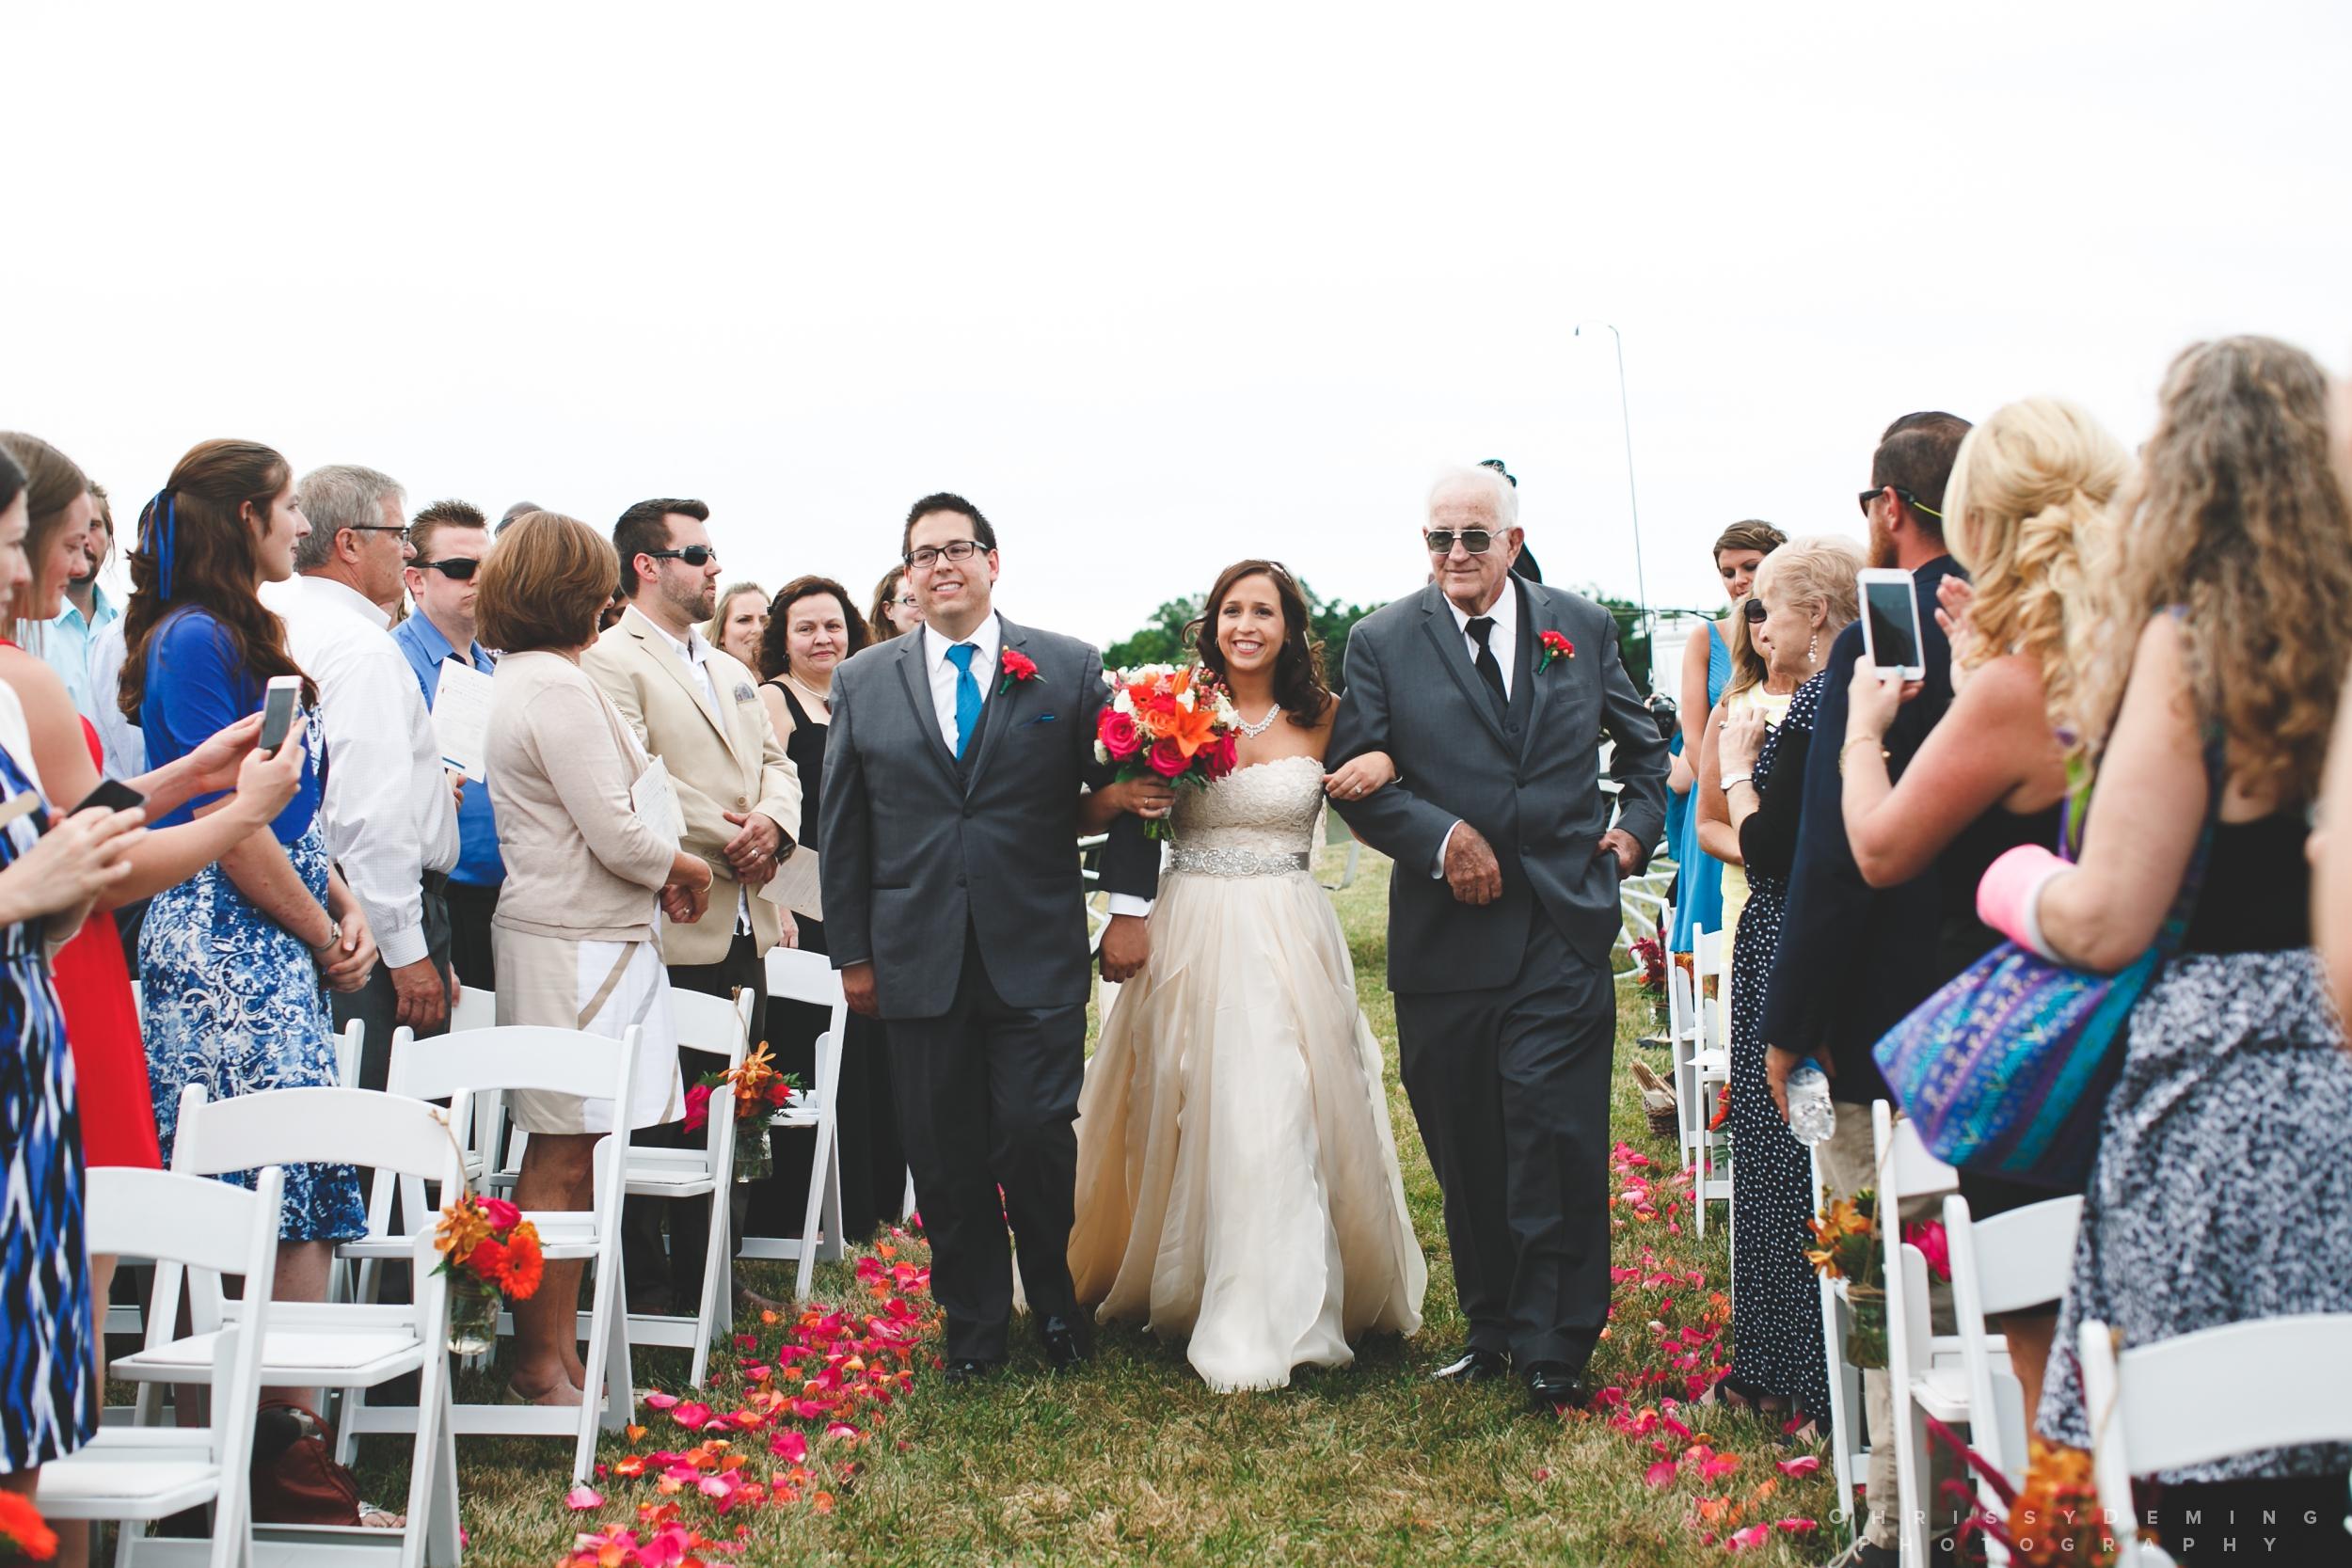 crete_IL_farm_wedding_photographer_0025.jpg